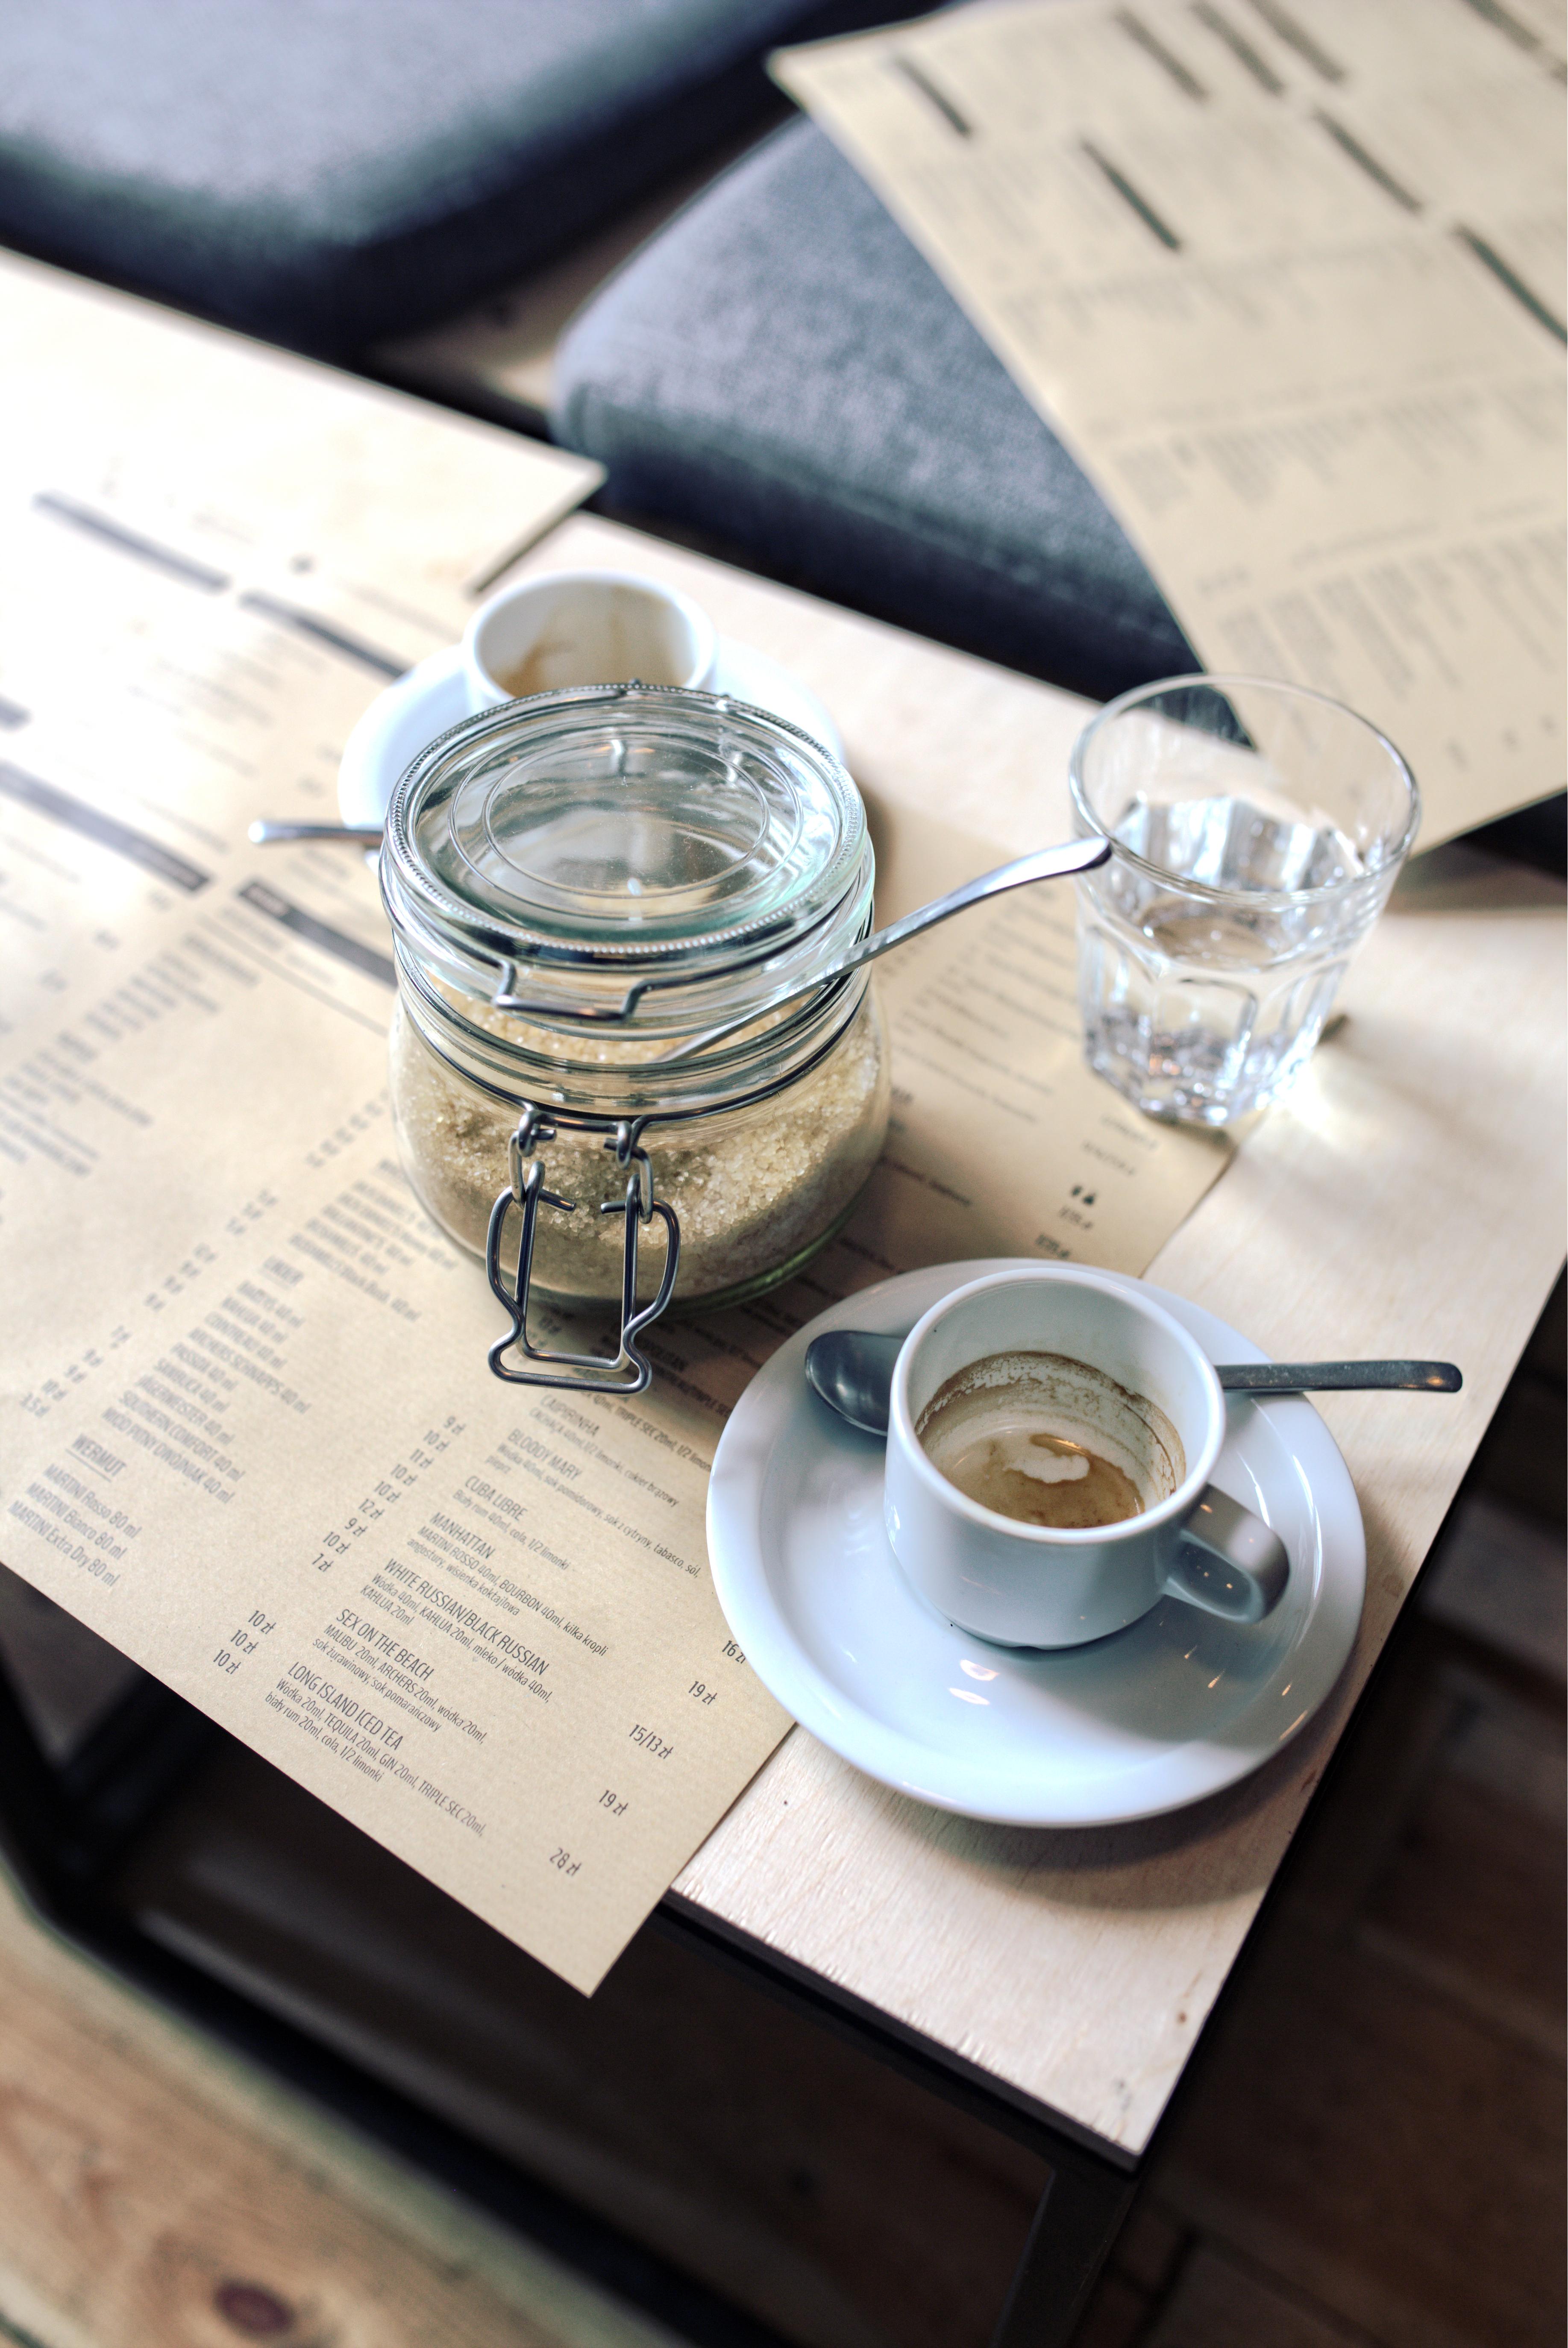 restaurant-coffee-morning-sugar.jpg (3670×5496)